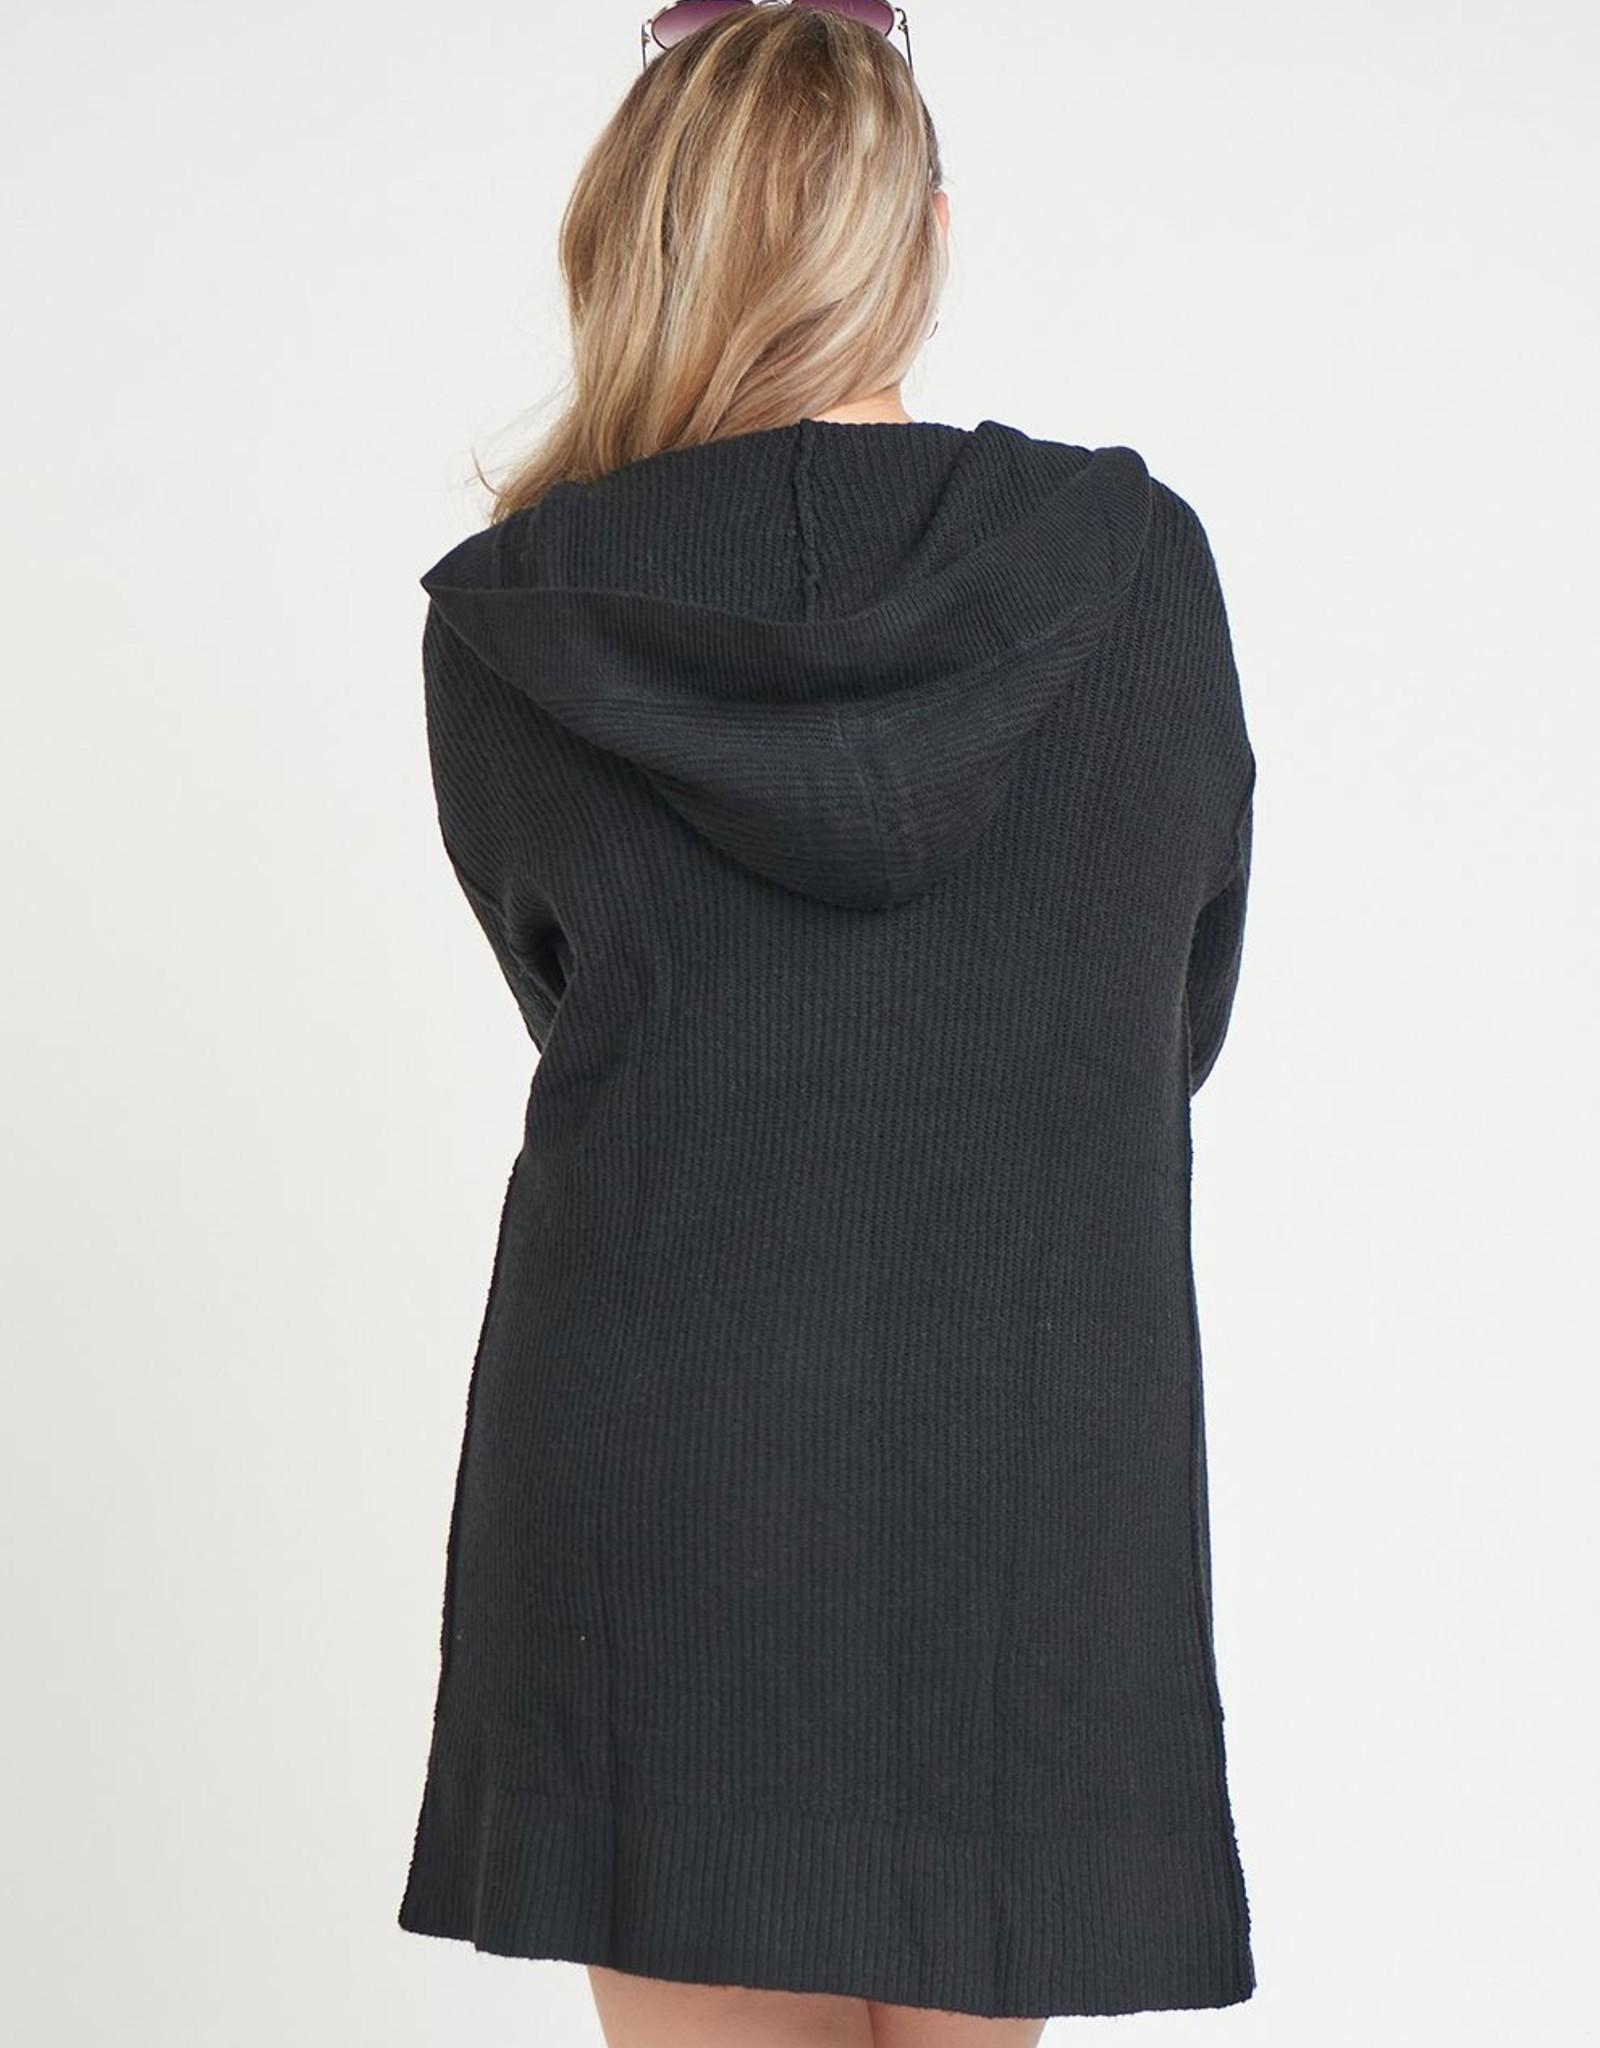 Dex Black Hooded Cardigan Plus